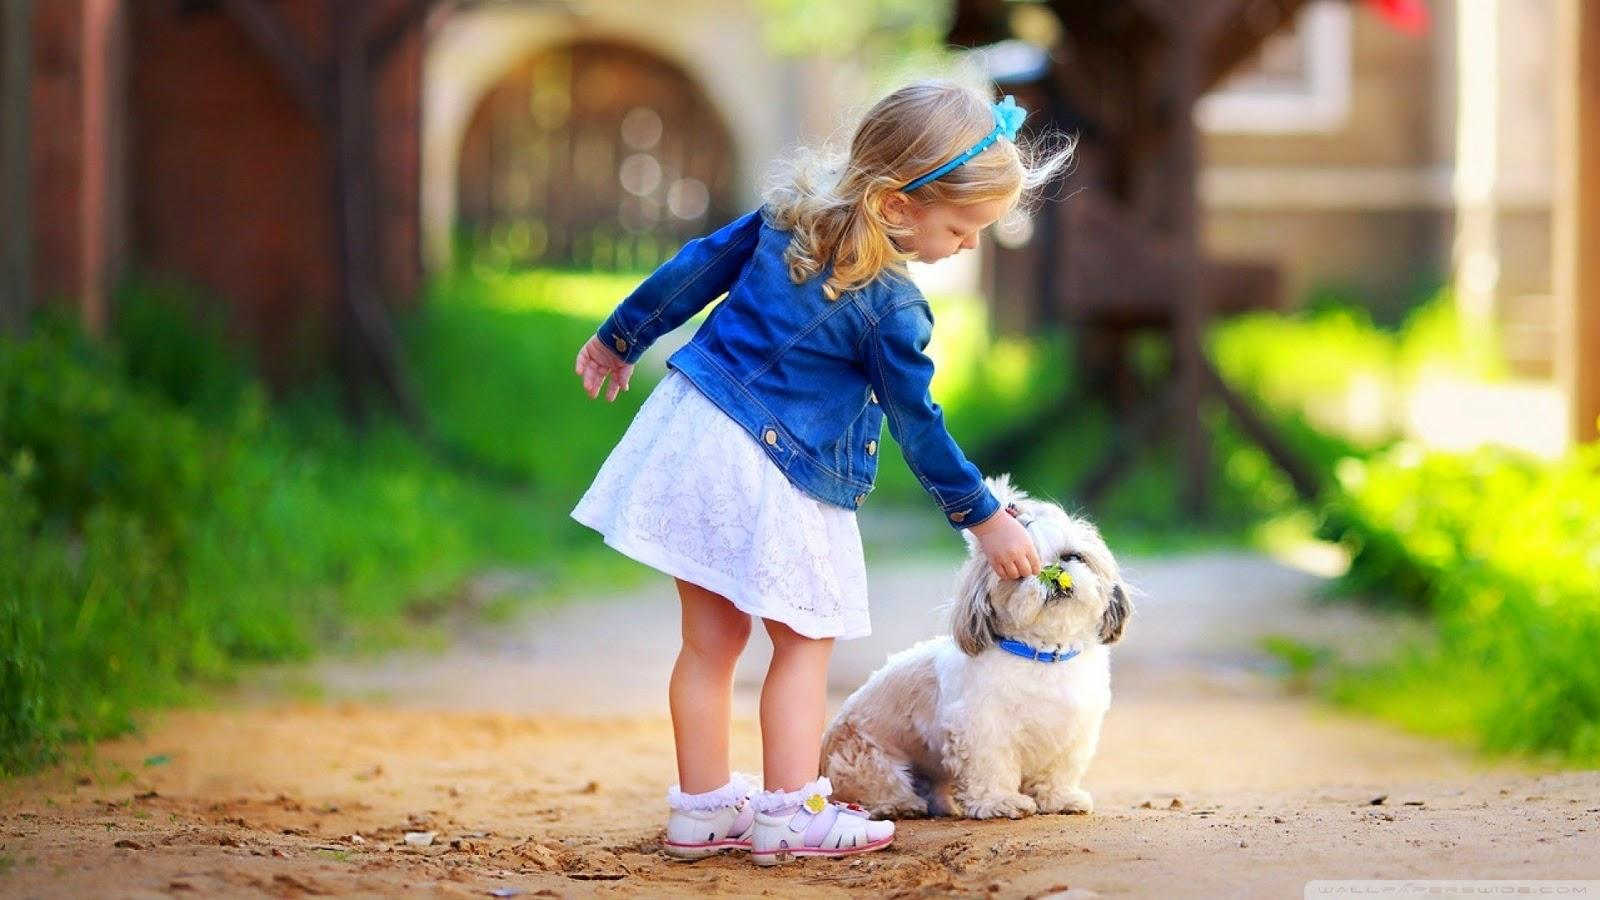 girl and dog wallpaper